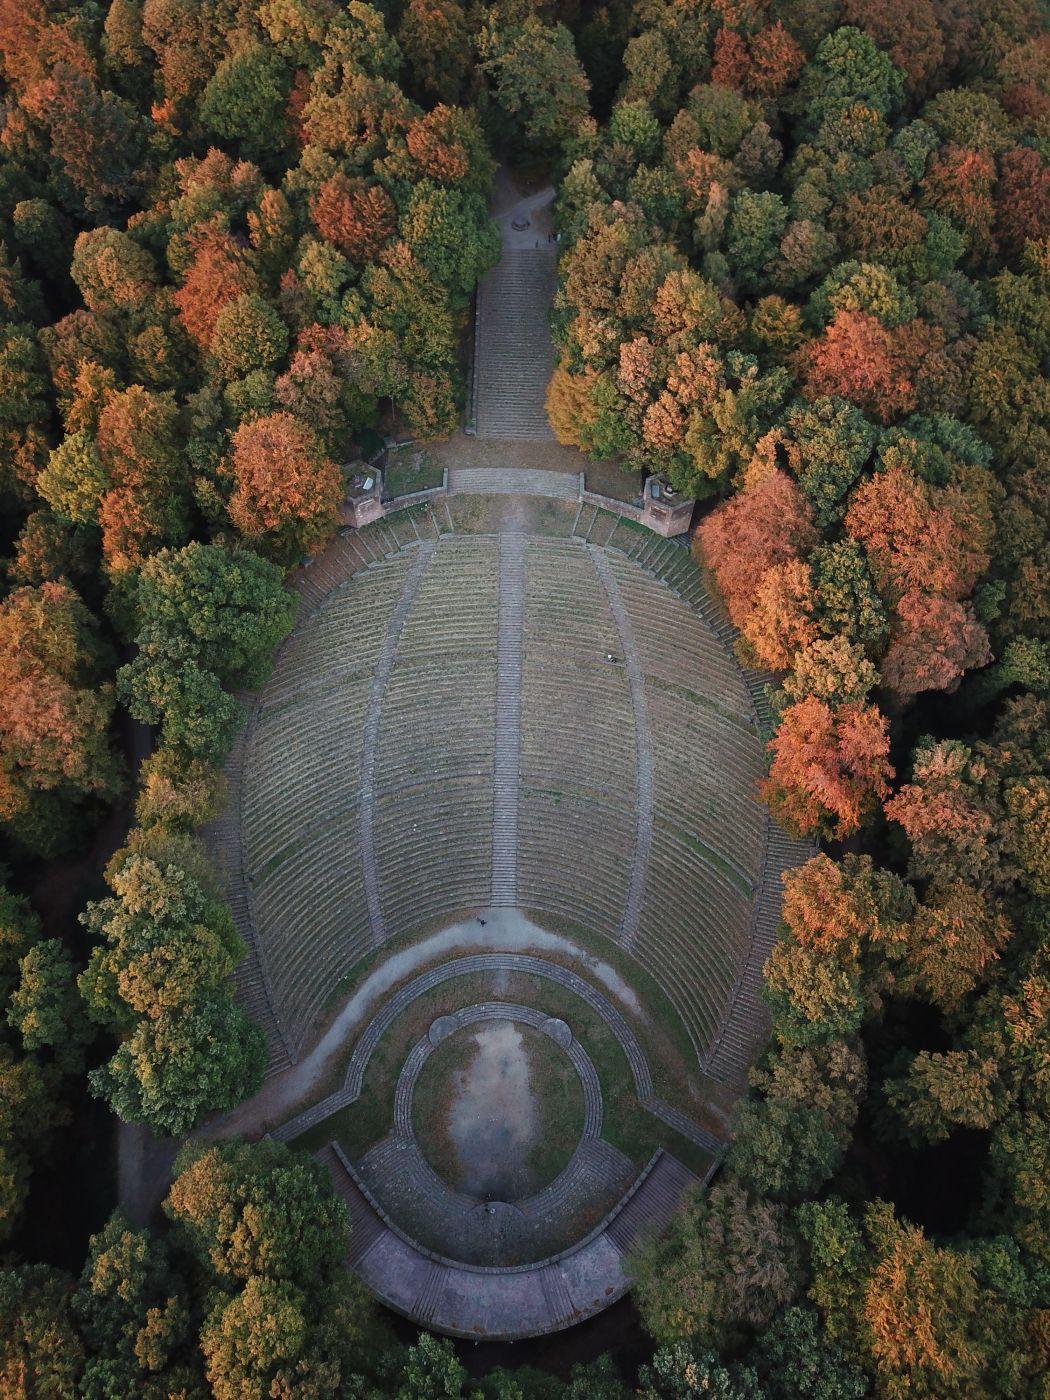 Thinkstätte [Drone], Germany